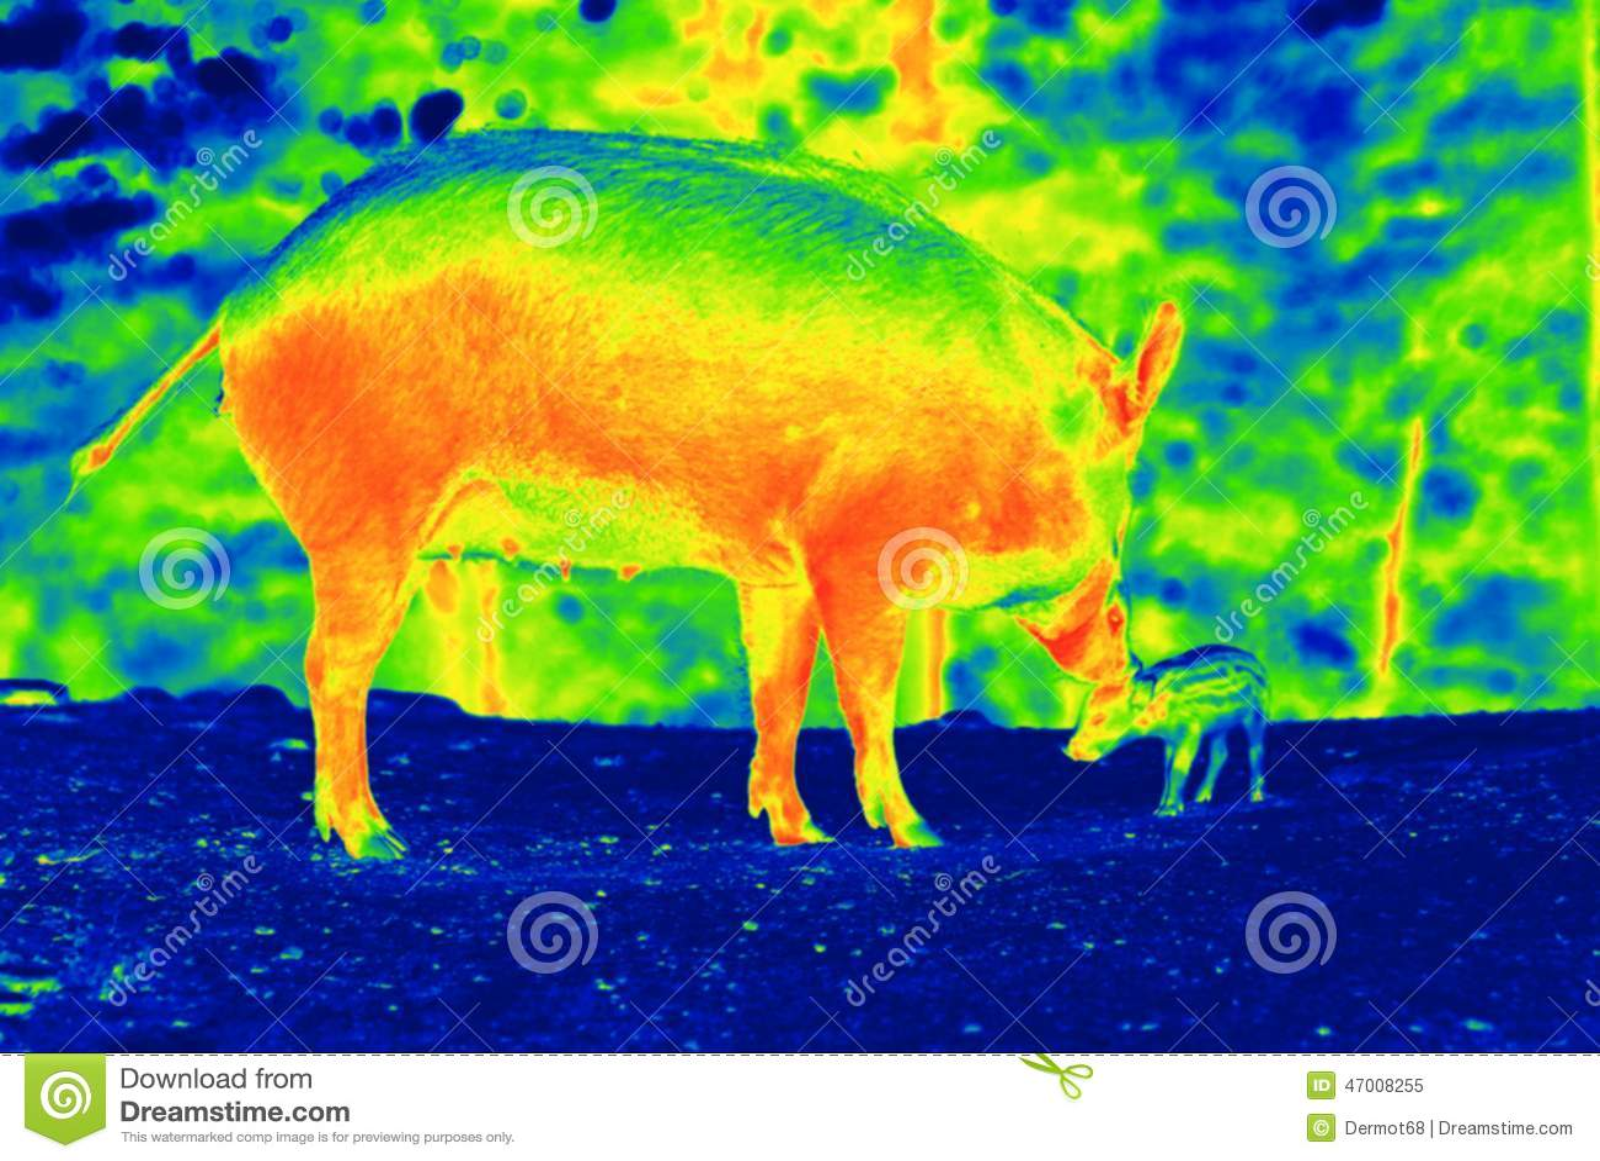 21 Bear Thermal Photos   Free & Royalty Free Stock Photos from ...